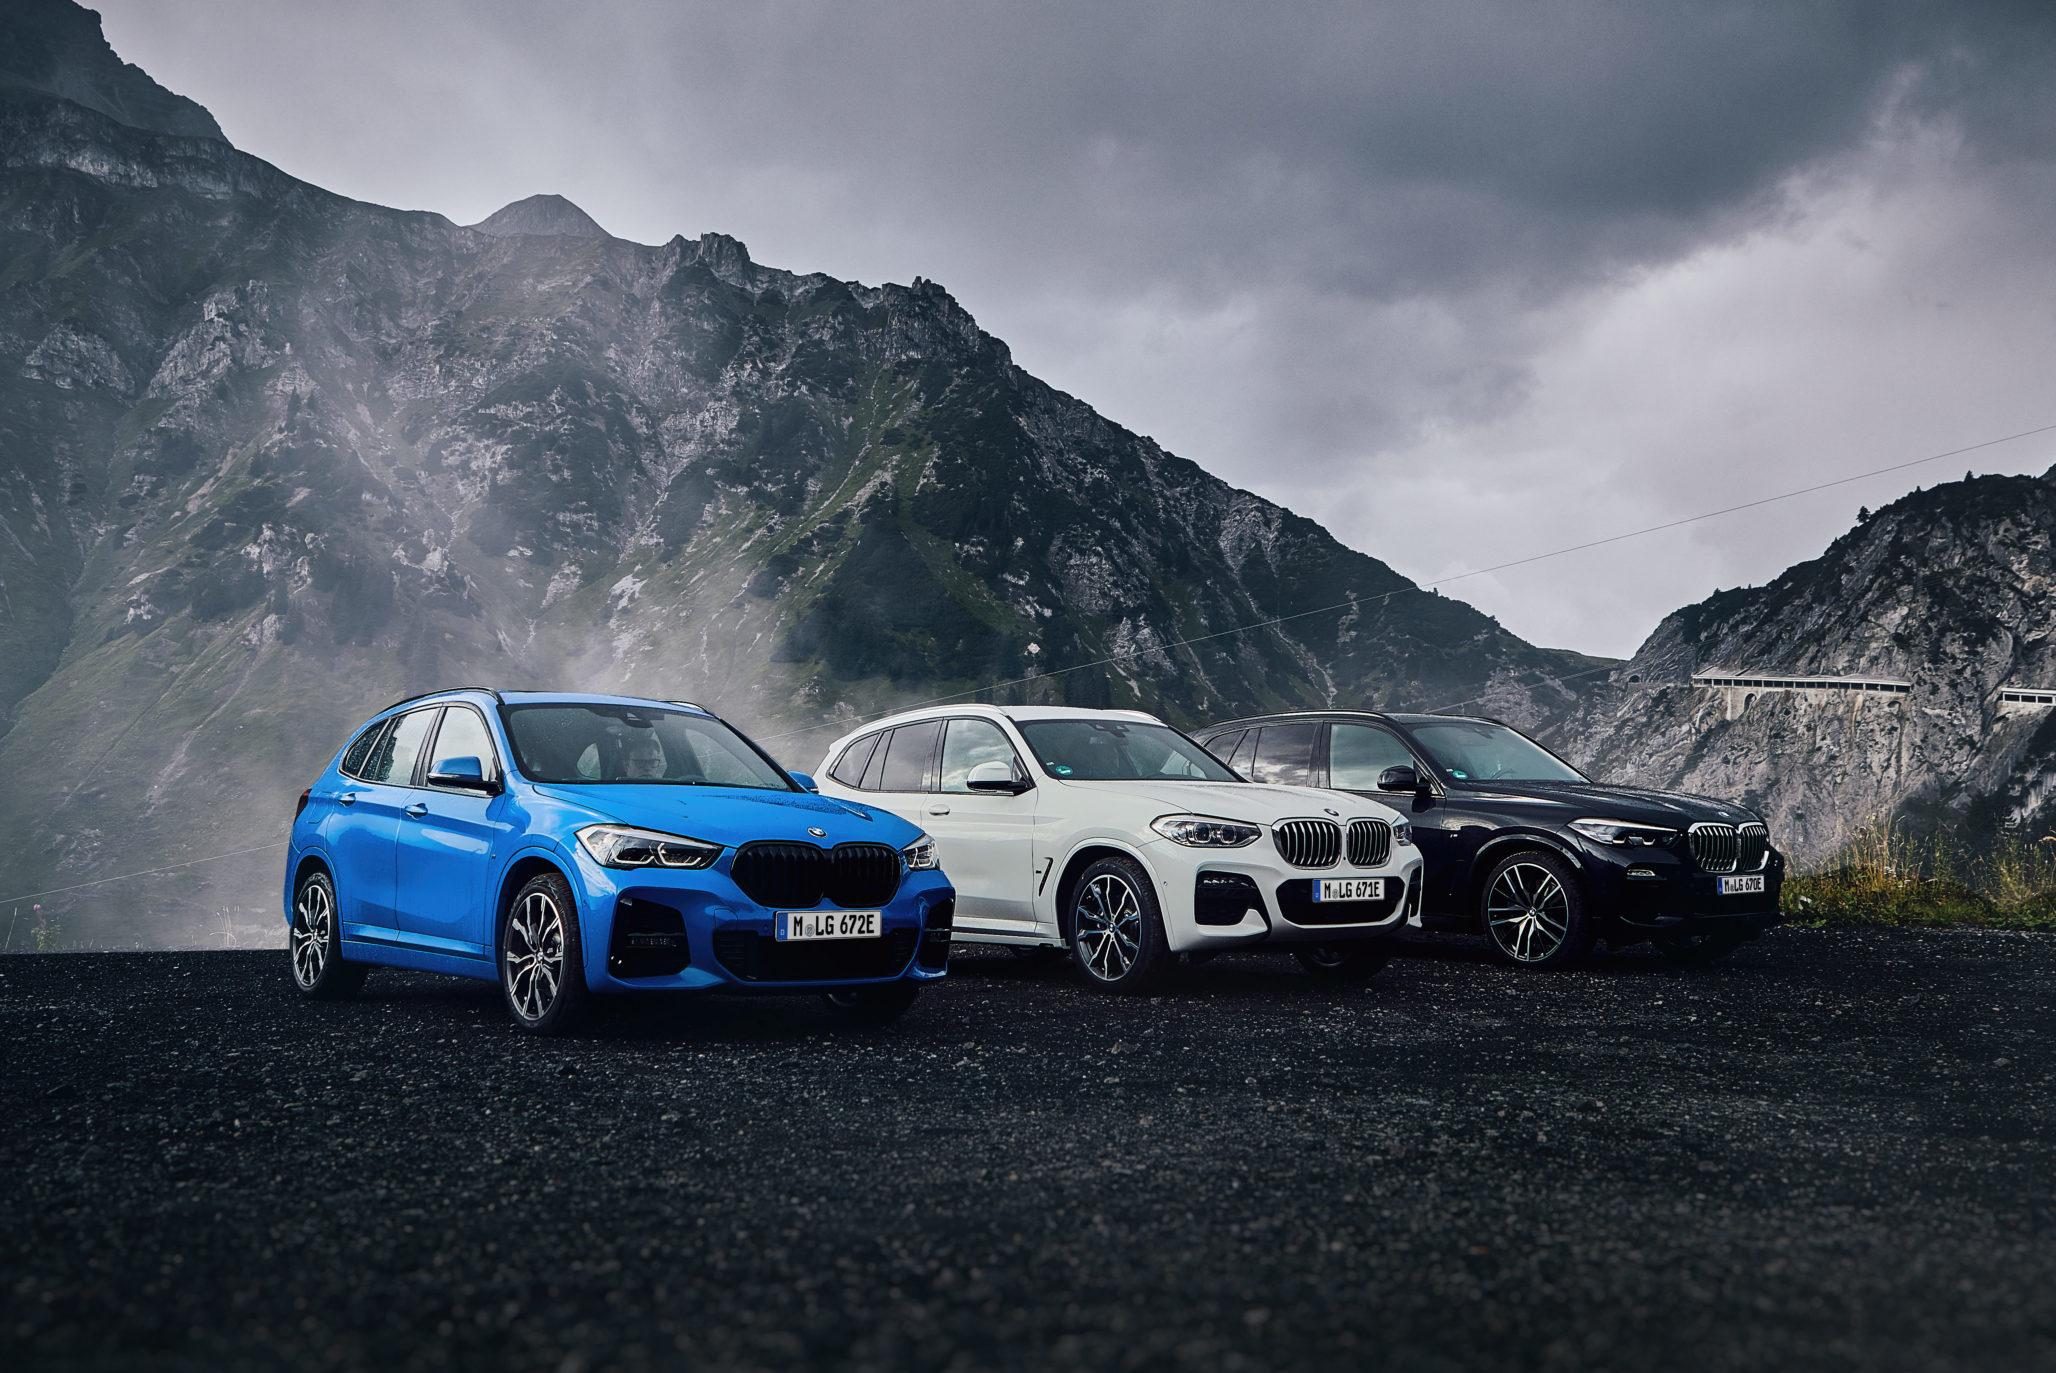 X1 xDrive25e, X3 xDrive30e, X5 xDrive45e